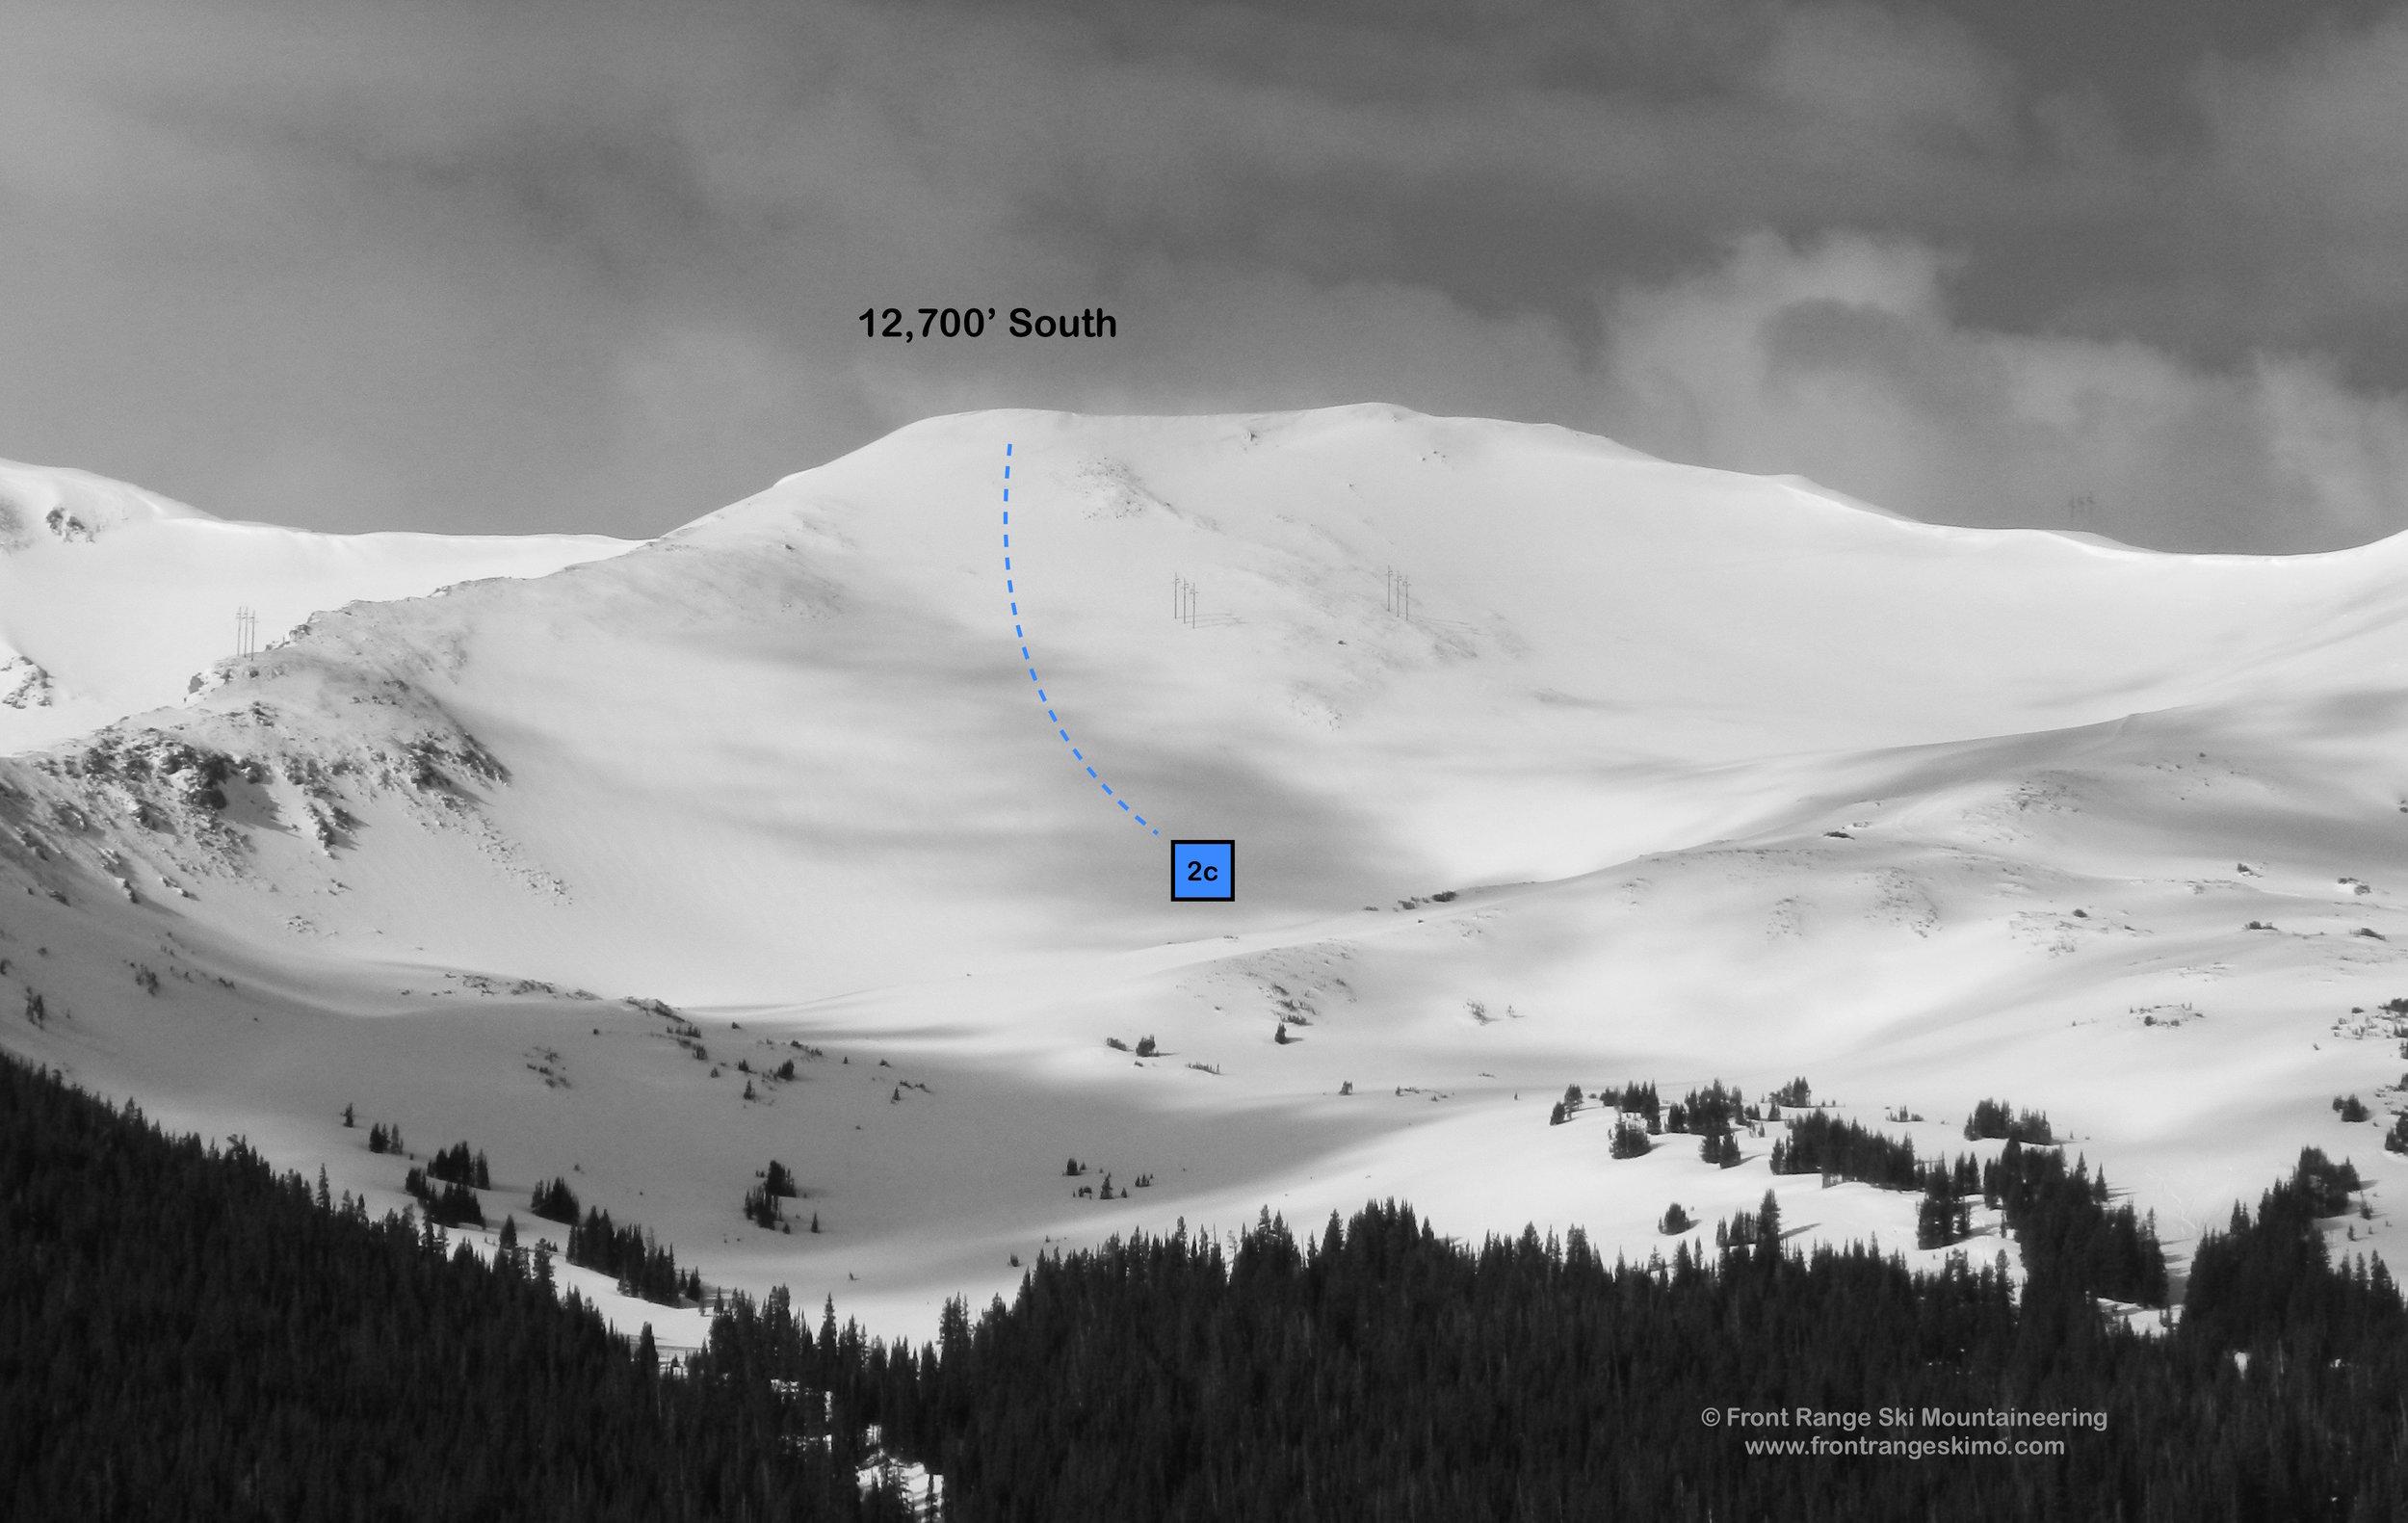 The South Twin 12,700' Peak at Jones Pass.